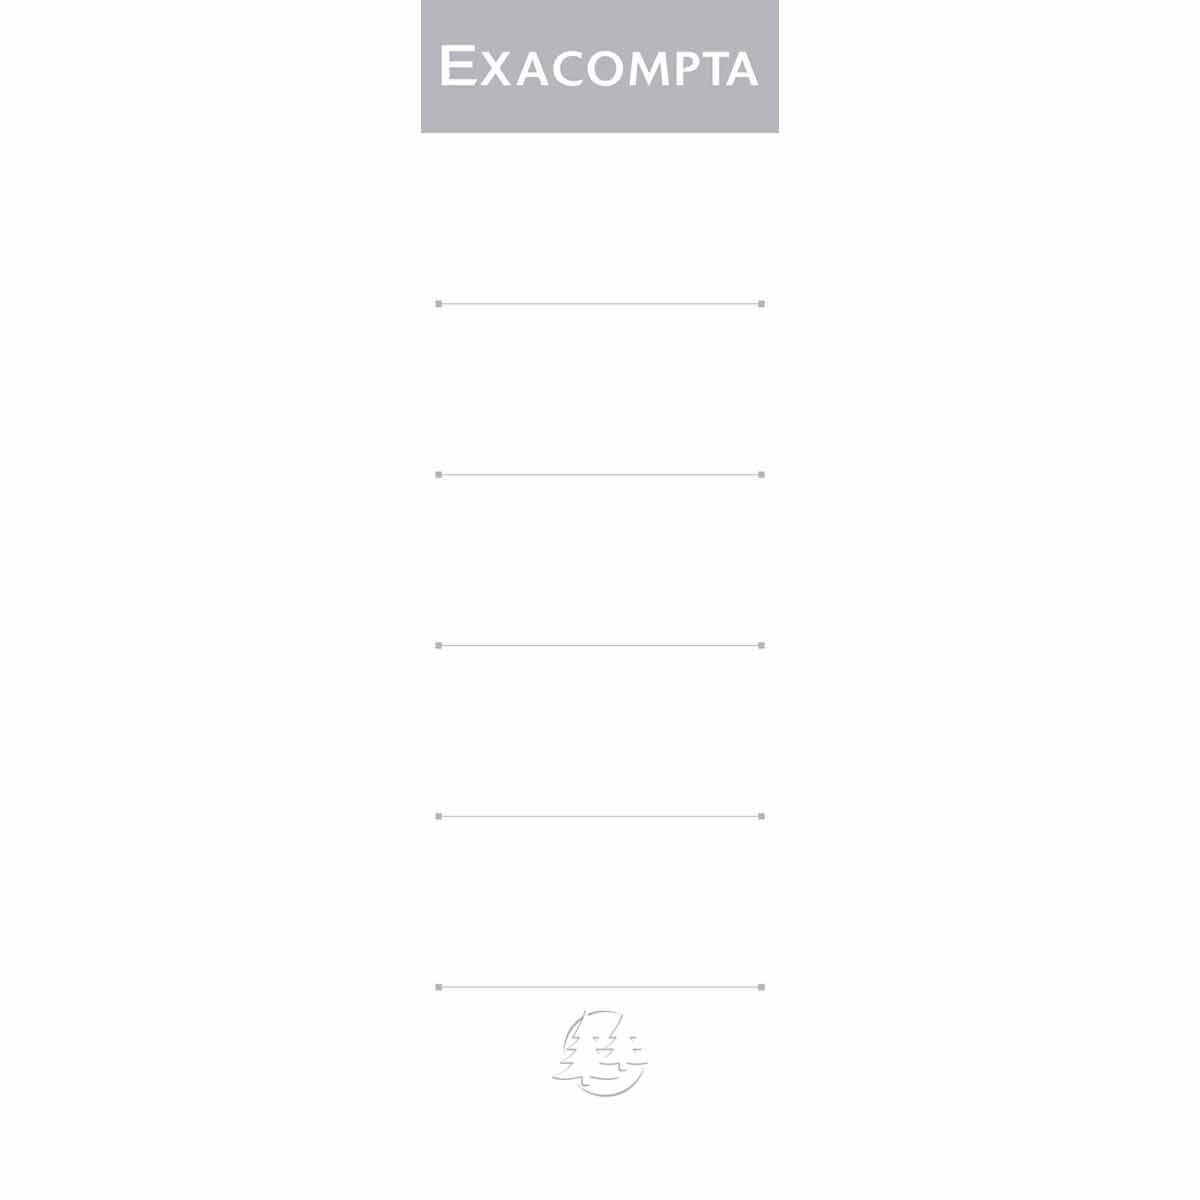 Exacompta Lever Arch File Spine 80mm Labels Pack of 10